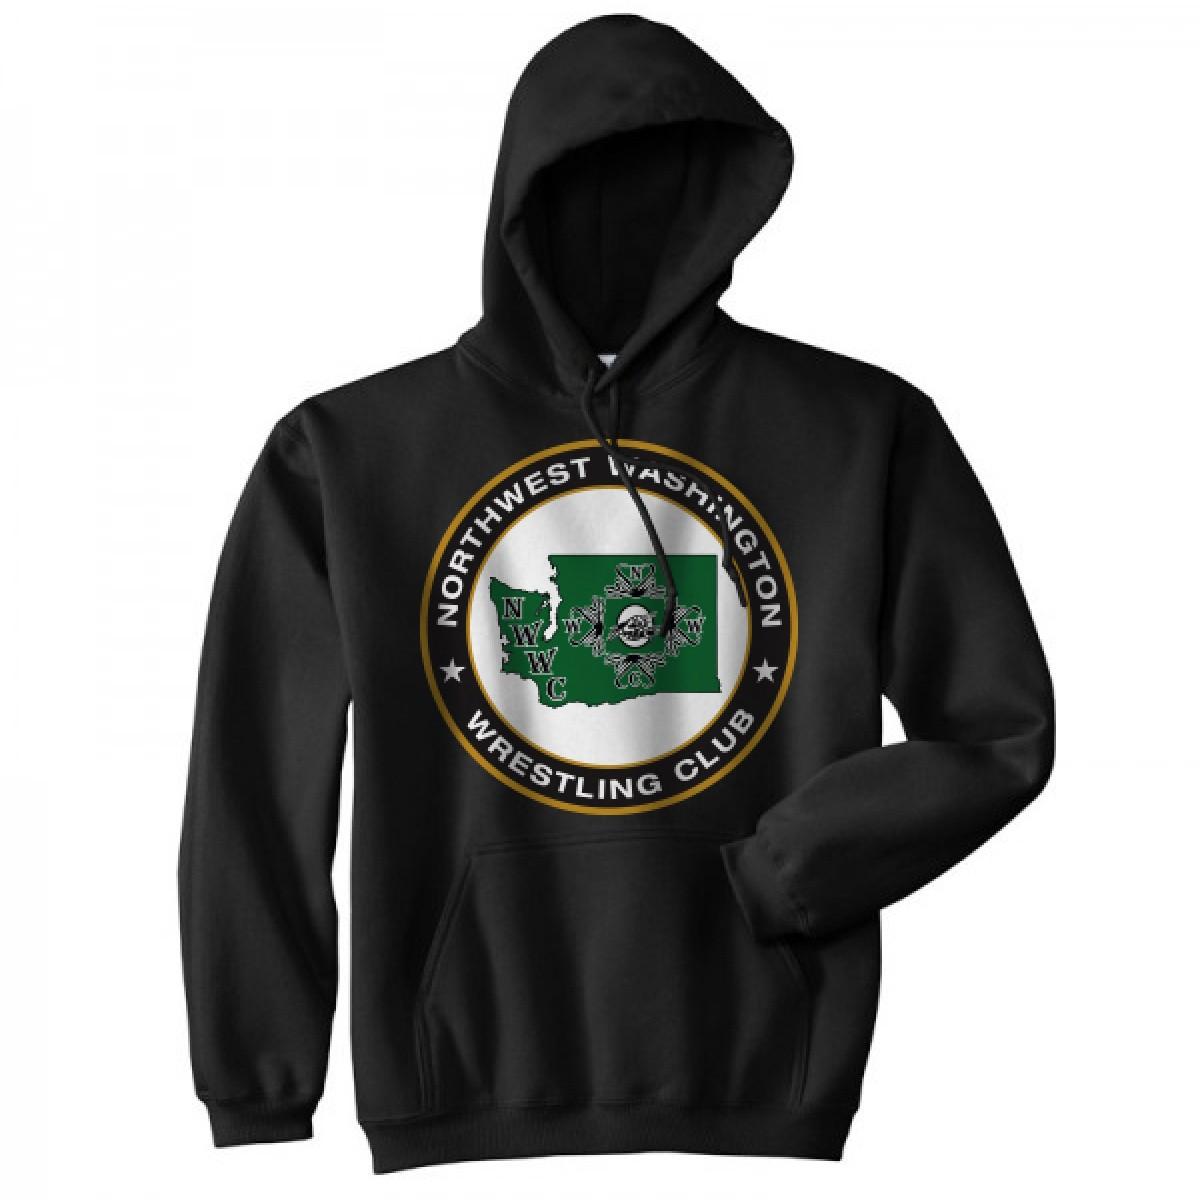 NWWC Black Hoodie With Green Logo-Black-2XL